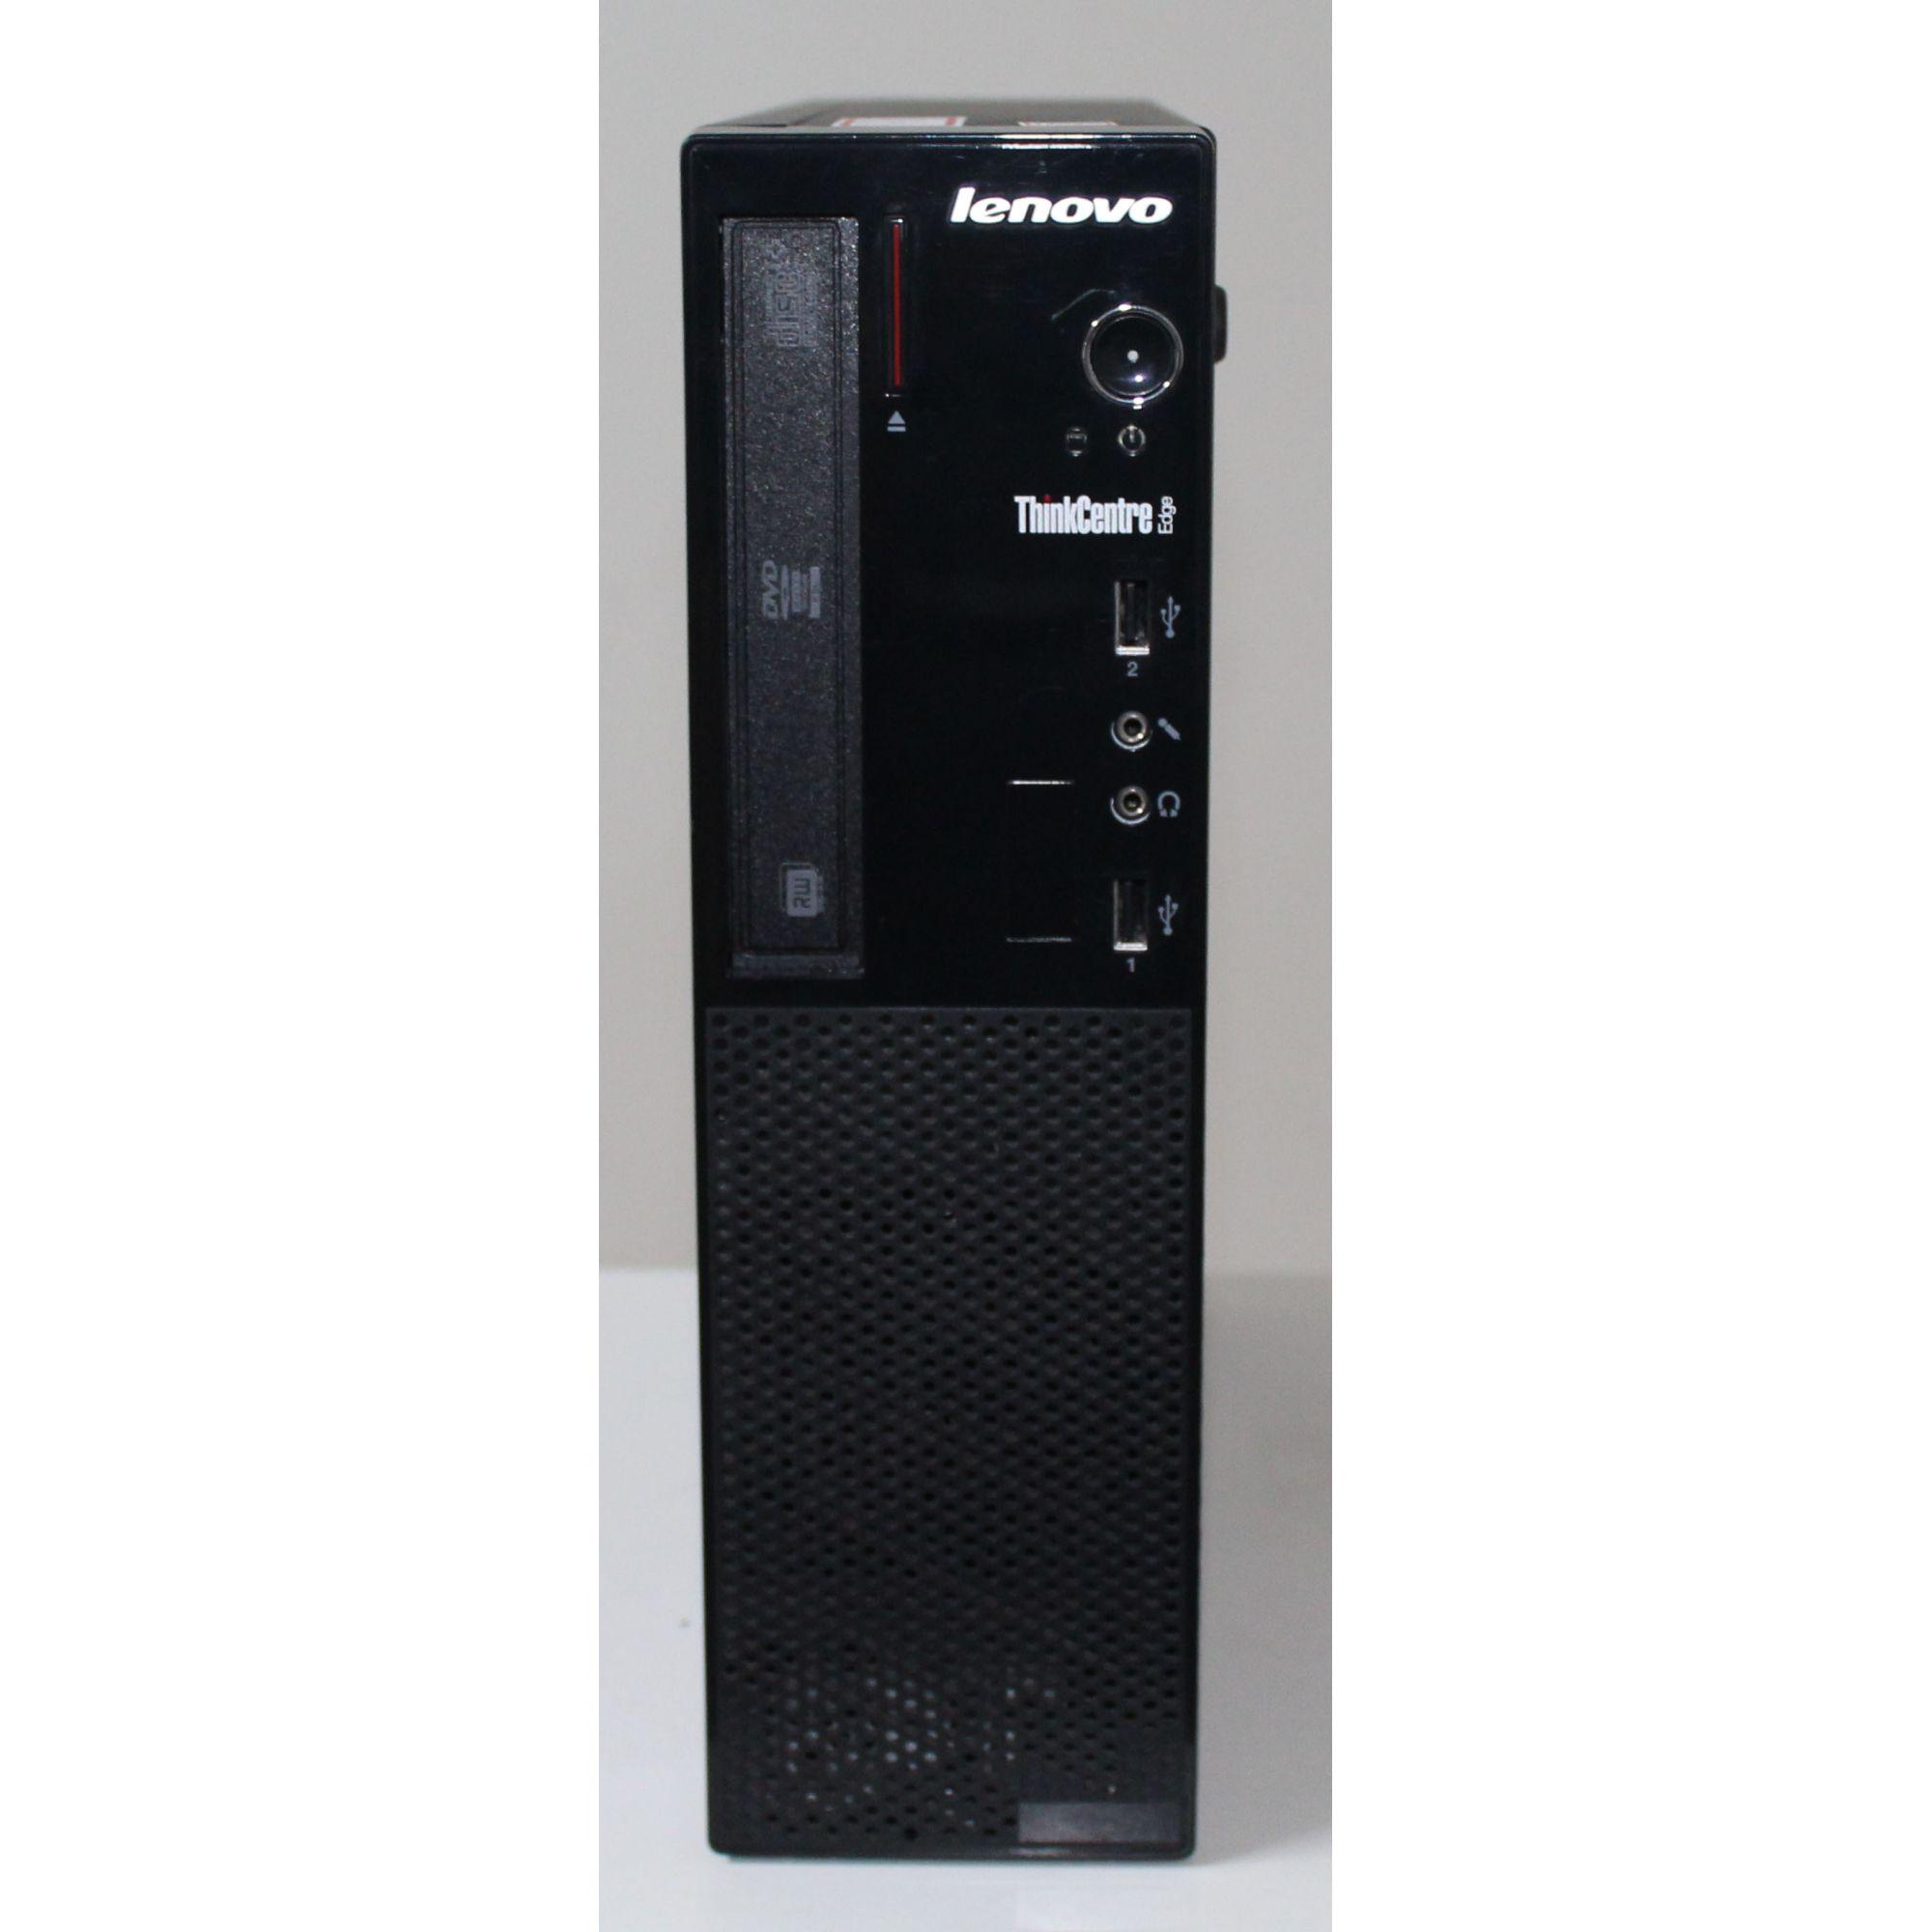 Computador Lenovo ThinkCentre Edge72 i5 2.9Ghz 8GB HD-500GB